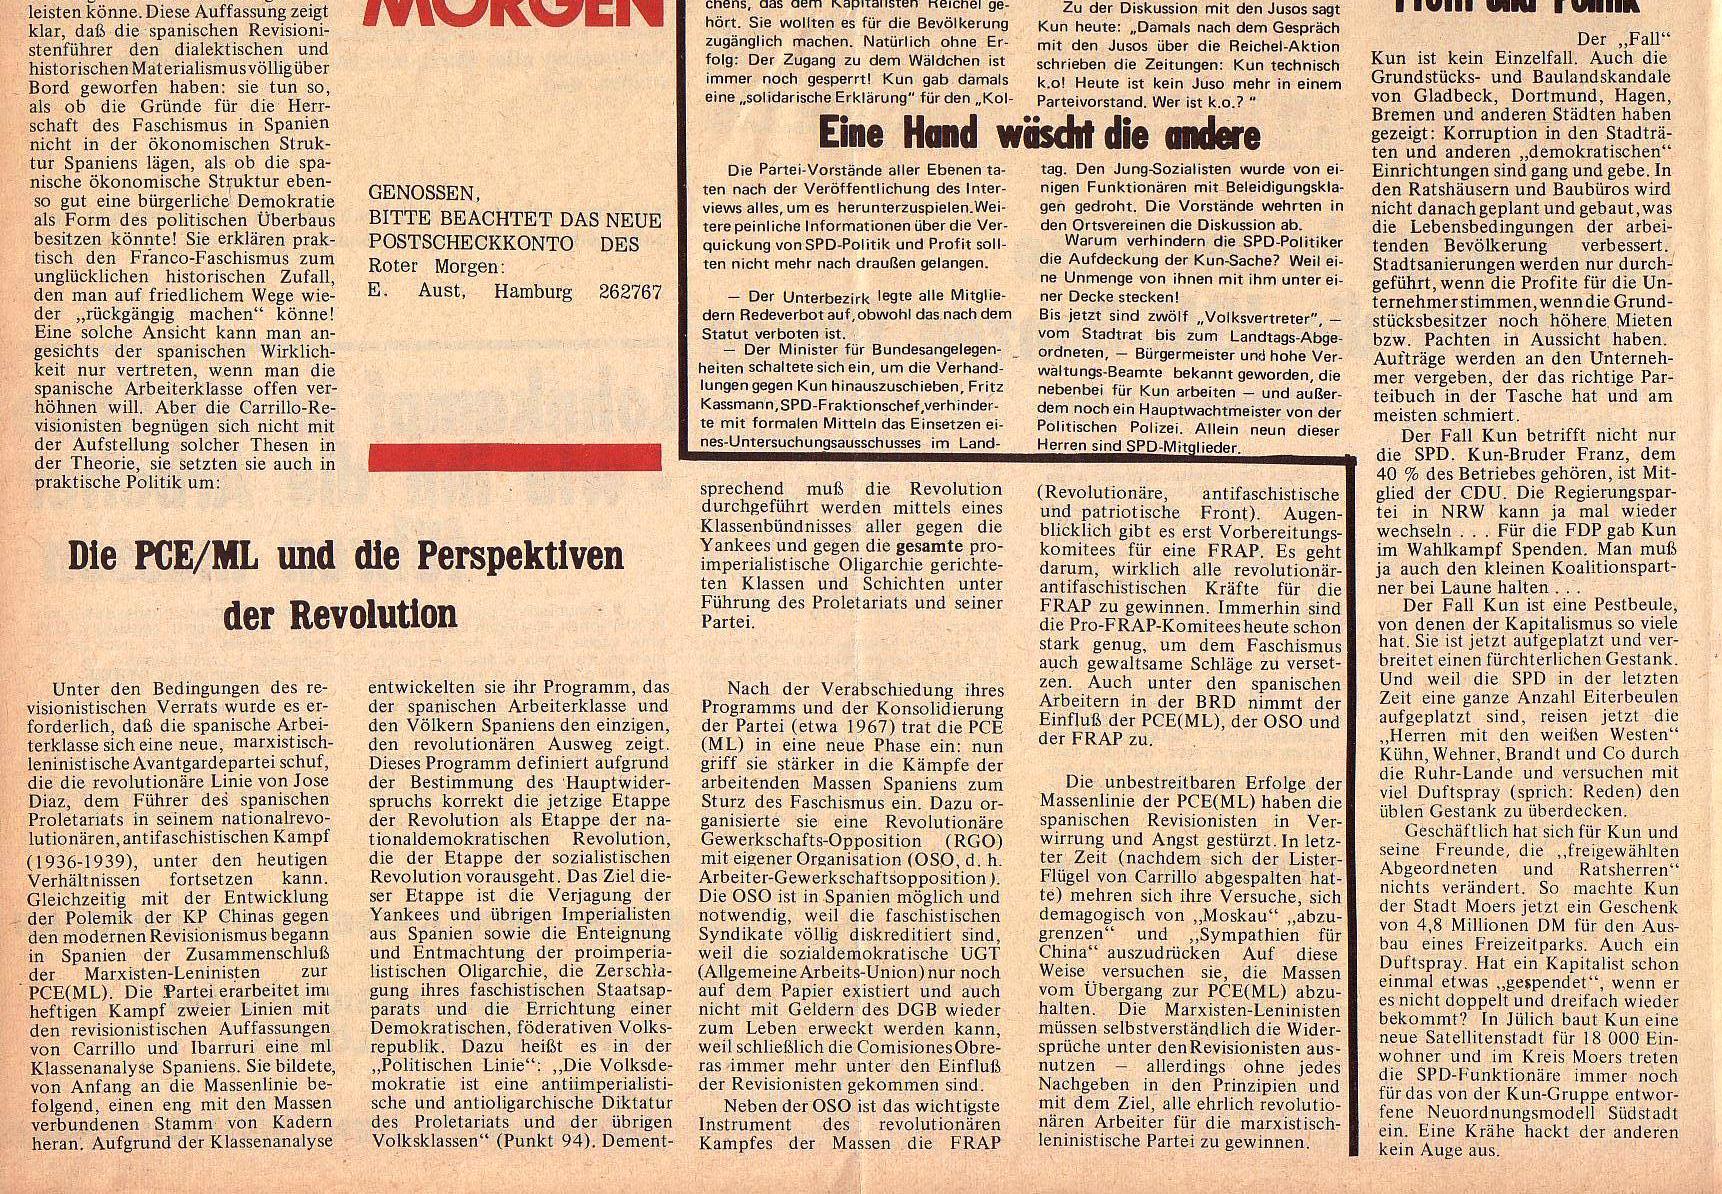 Roter Morgen, 5. Jg., 6. Dezember 1971, Nr. 15, Seite 8b